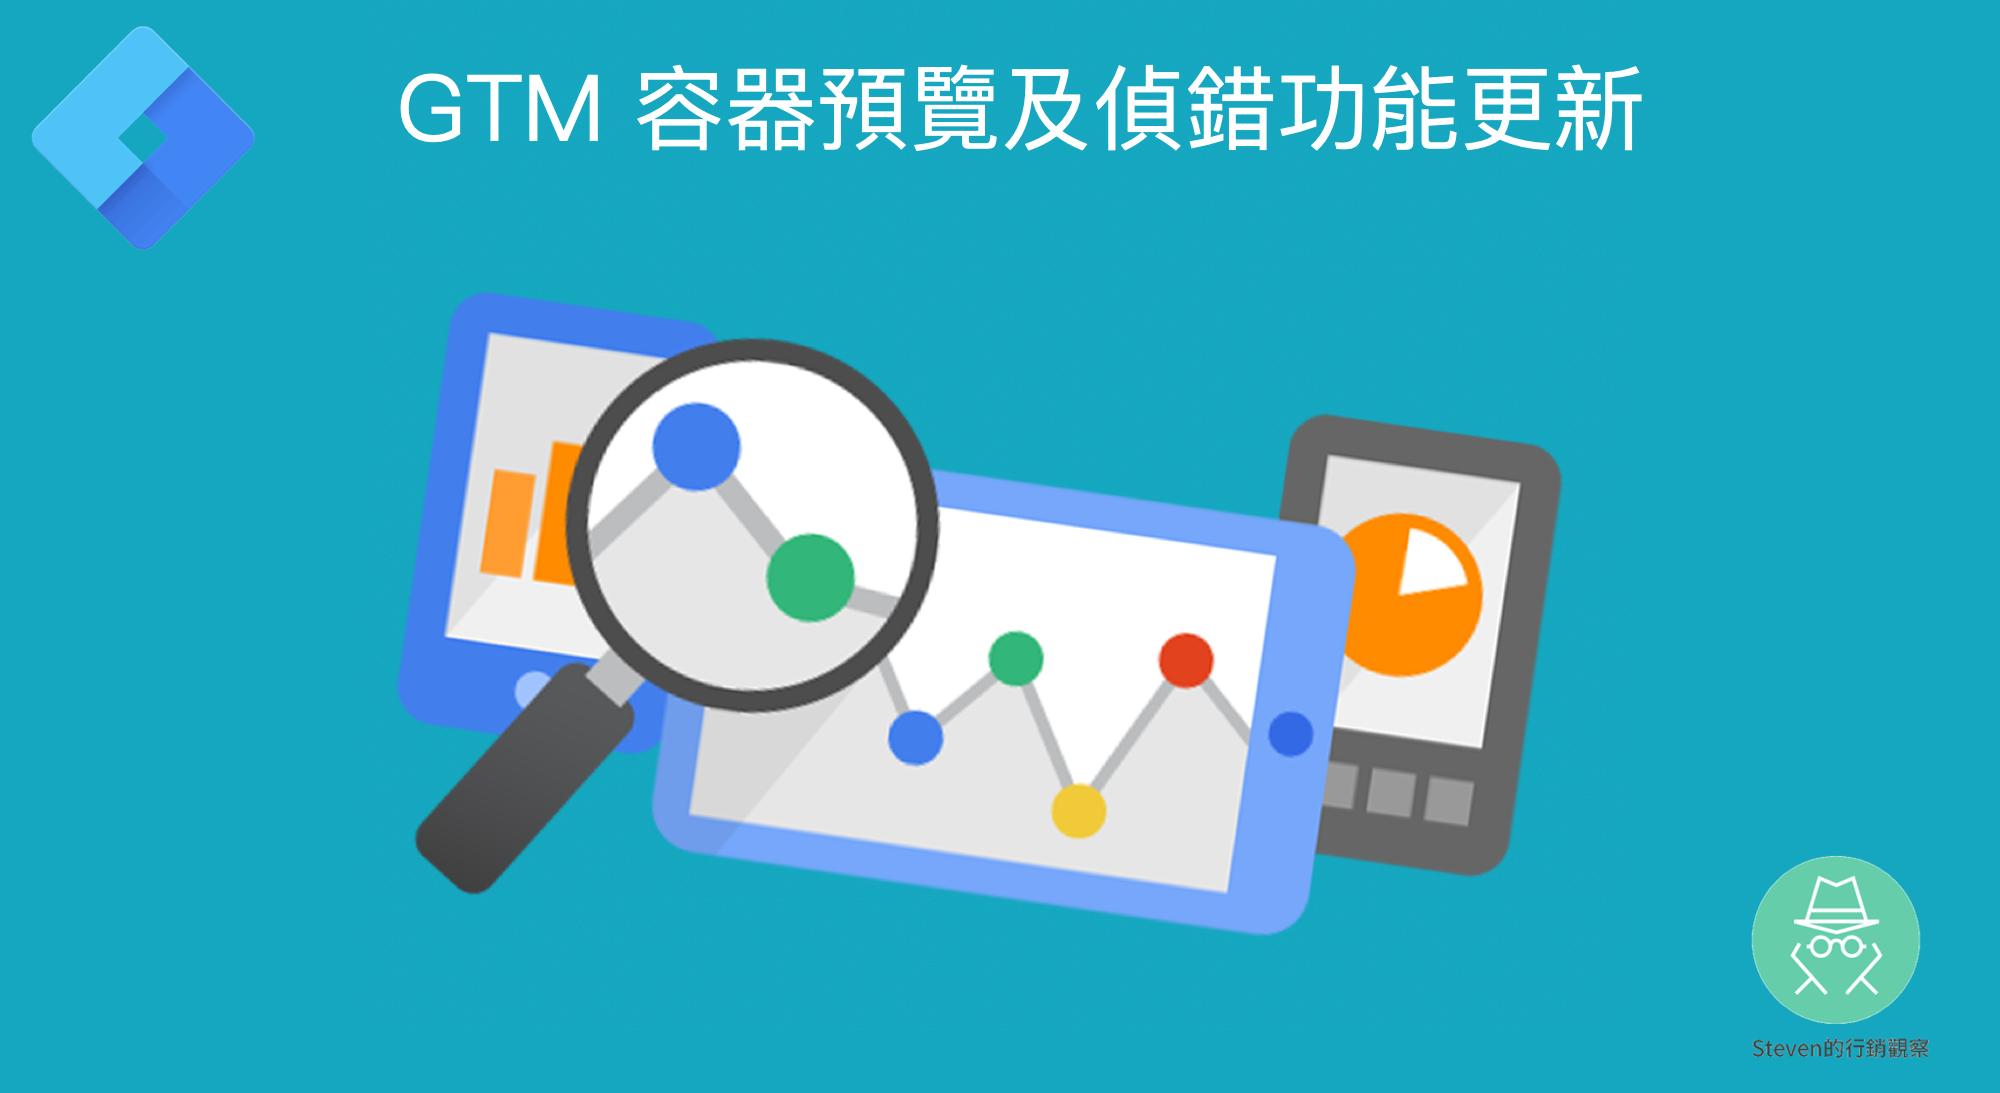 GTM 容器預覽及偵錯功能更新